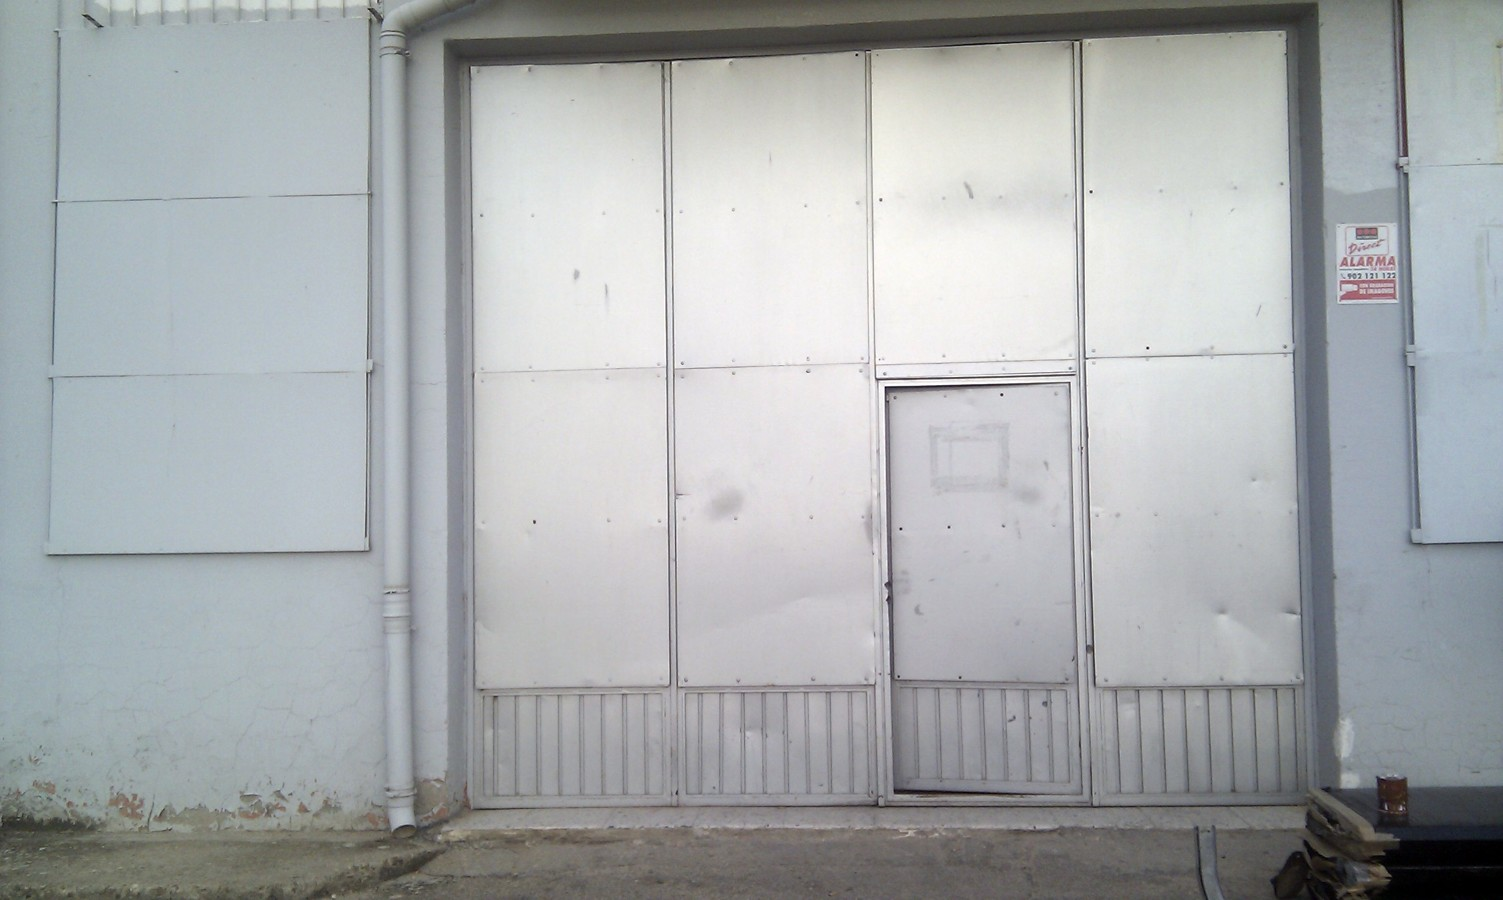 sustitucion de puertas para taller mecanico (antes)